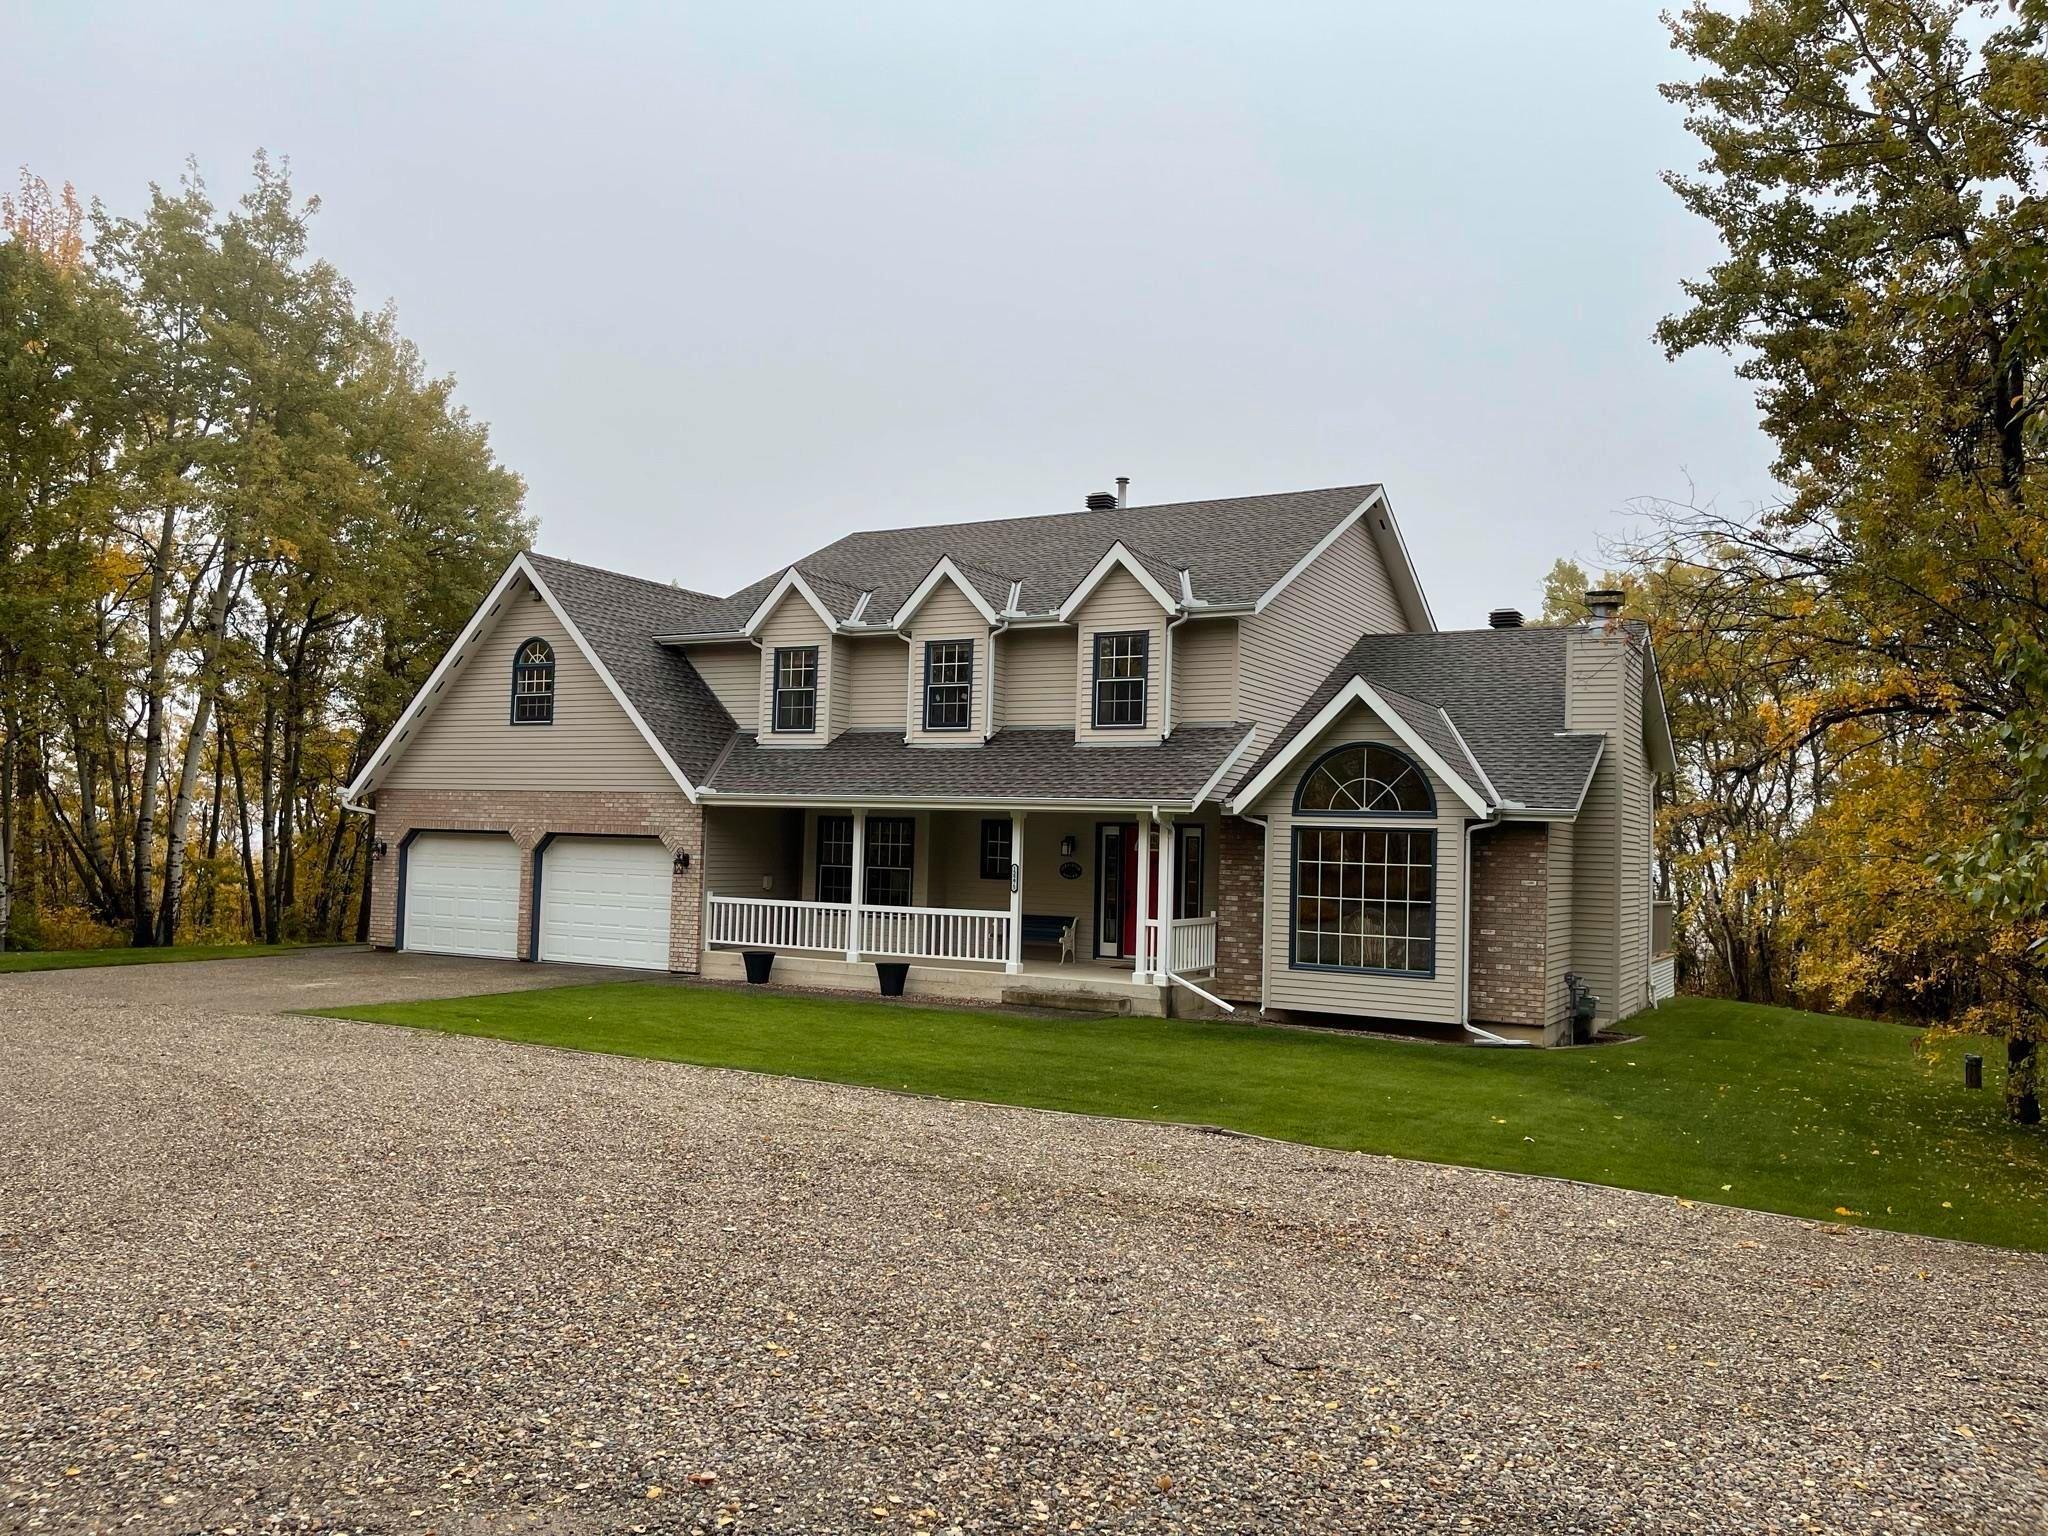 Main Photo: 12275 WESTVIEW Avenue in Fort St. John: Fort St. John - Rural W 100th House for sale (Fort St. John (Zone 60))  : MLS®# R2619877